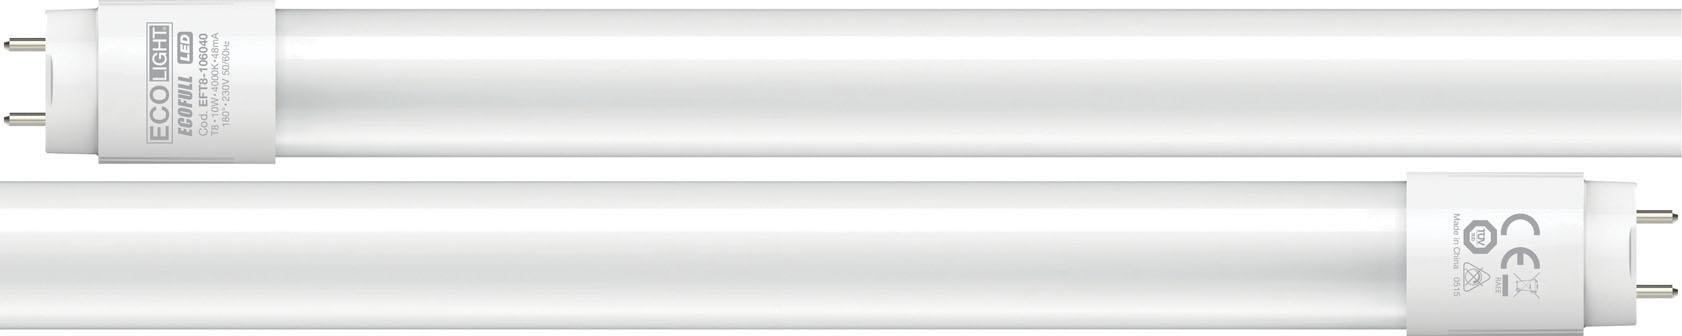 TUBO LED ECOFULL 10W  60CM CA